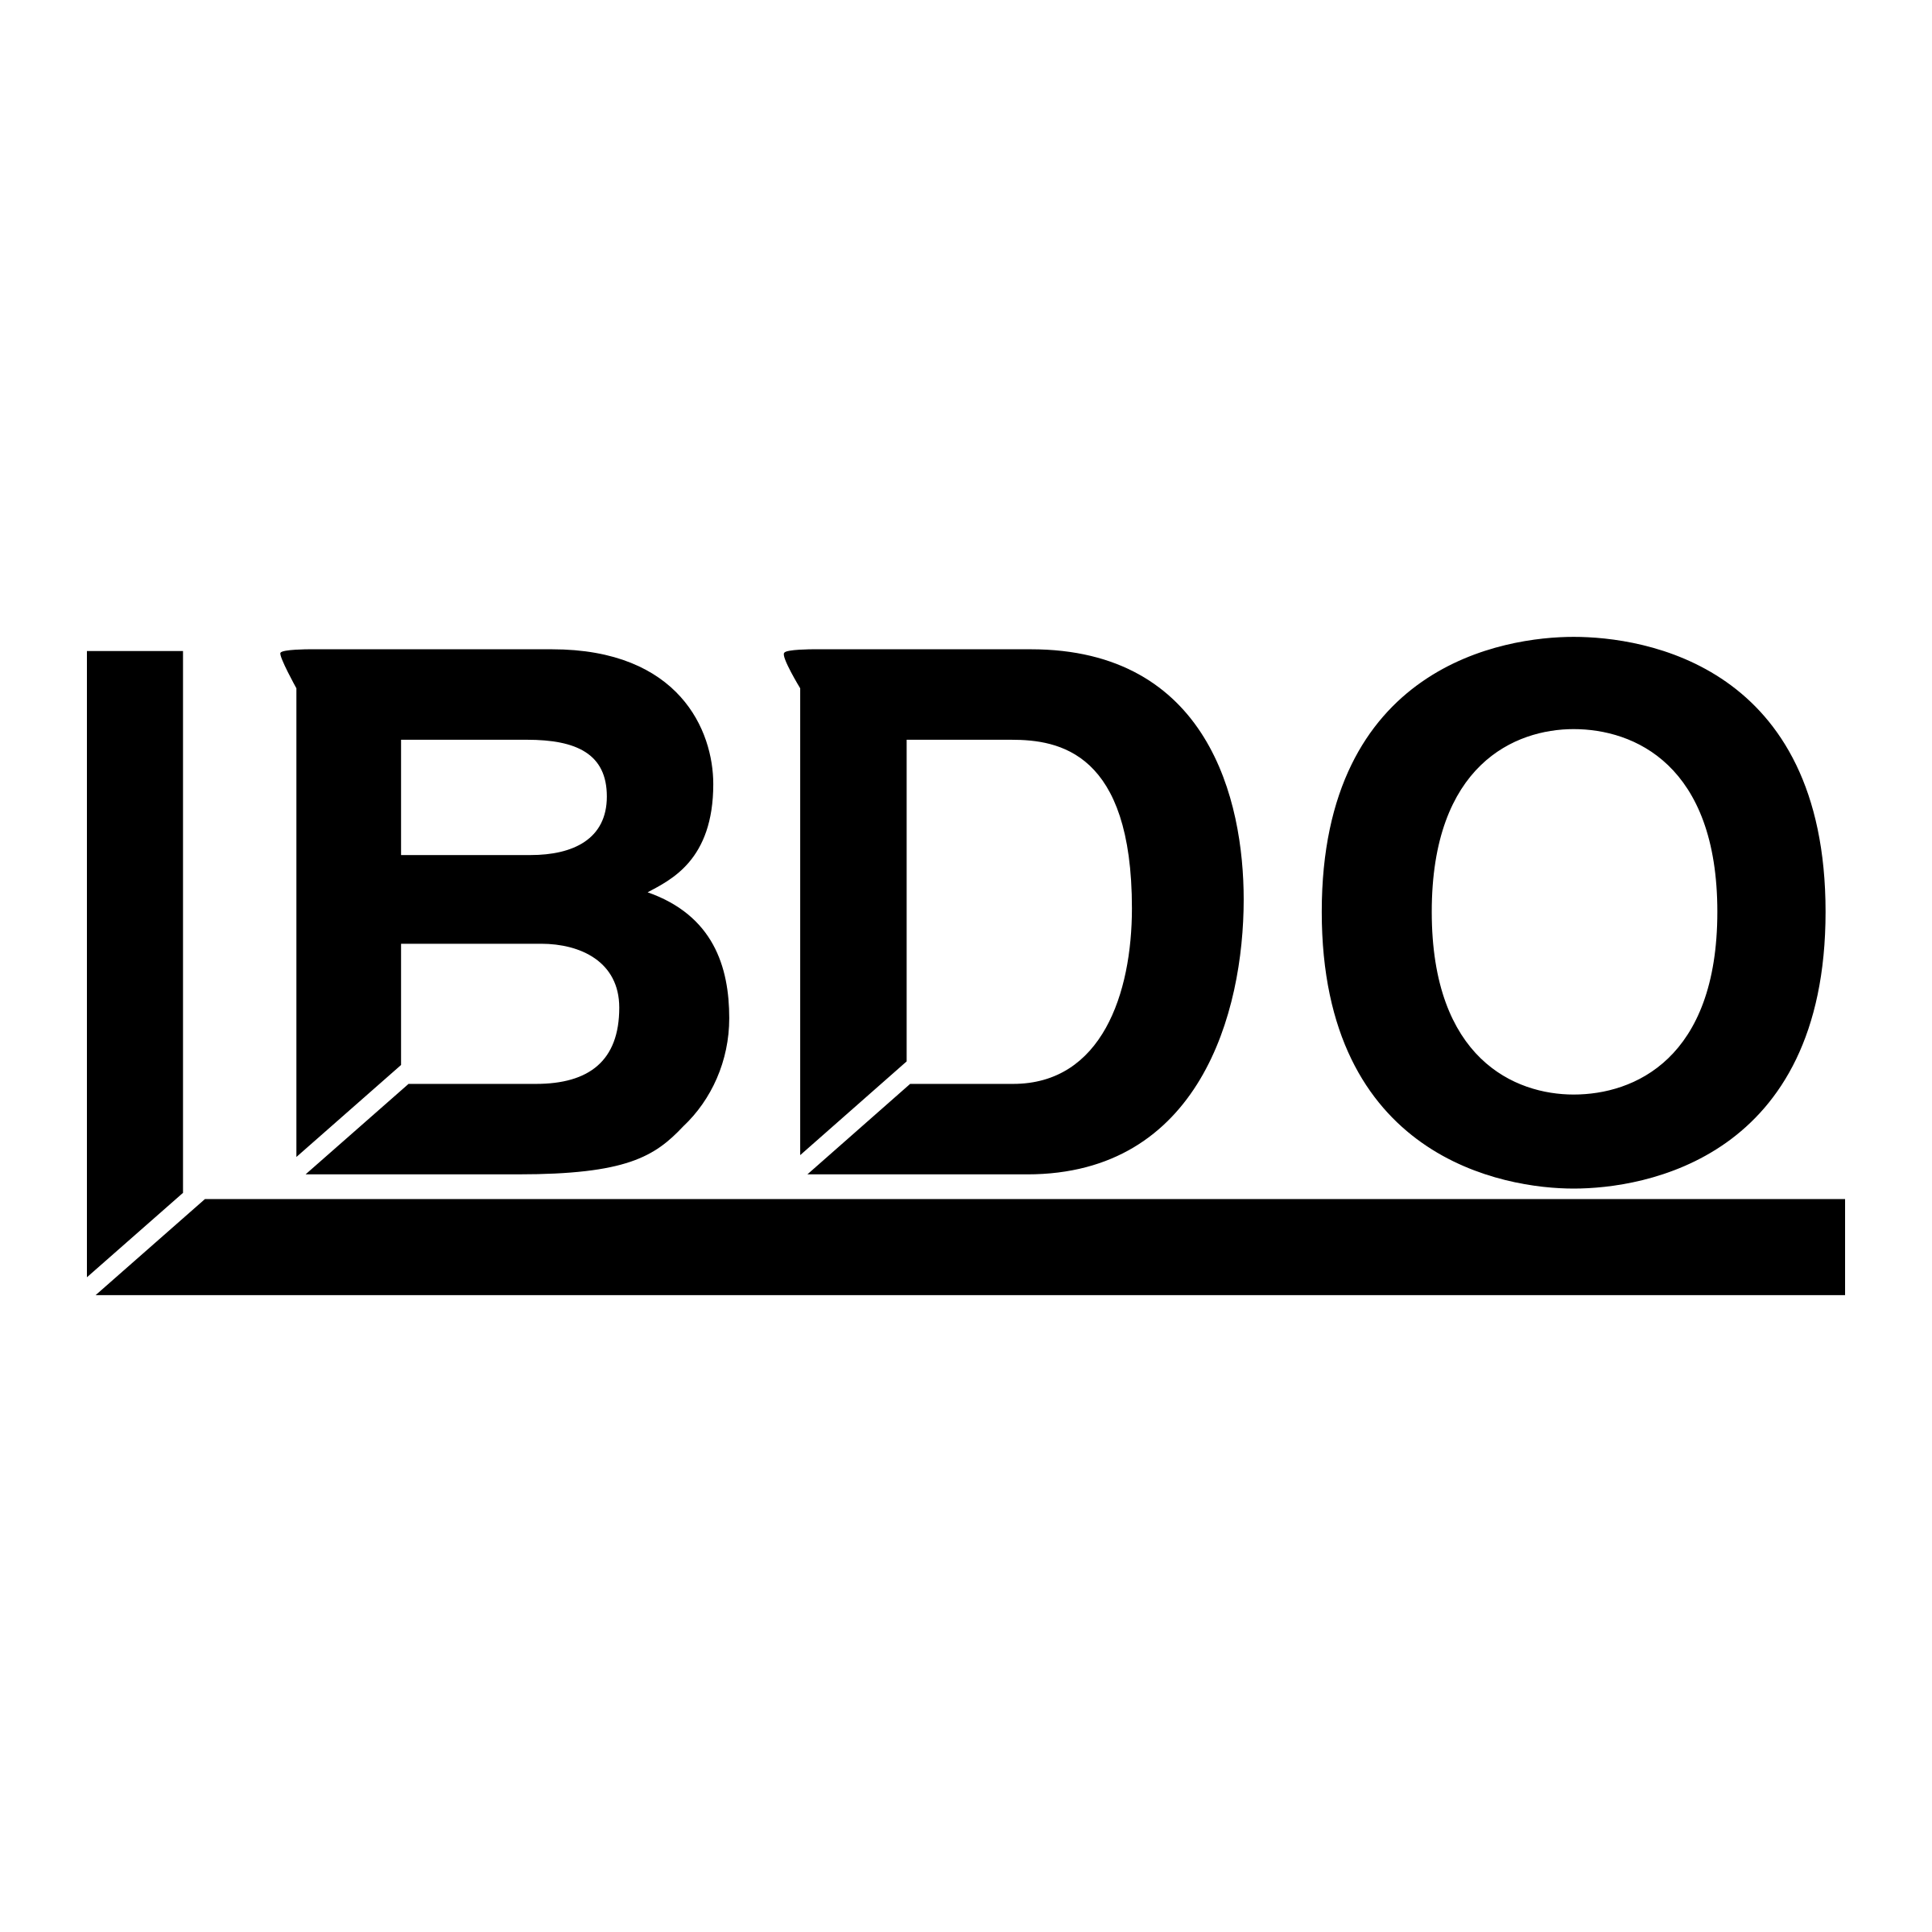 BDO 02 Logo PNG Transparent & SVG Vector.